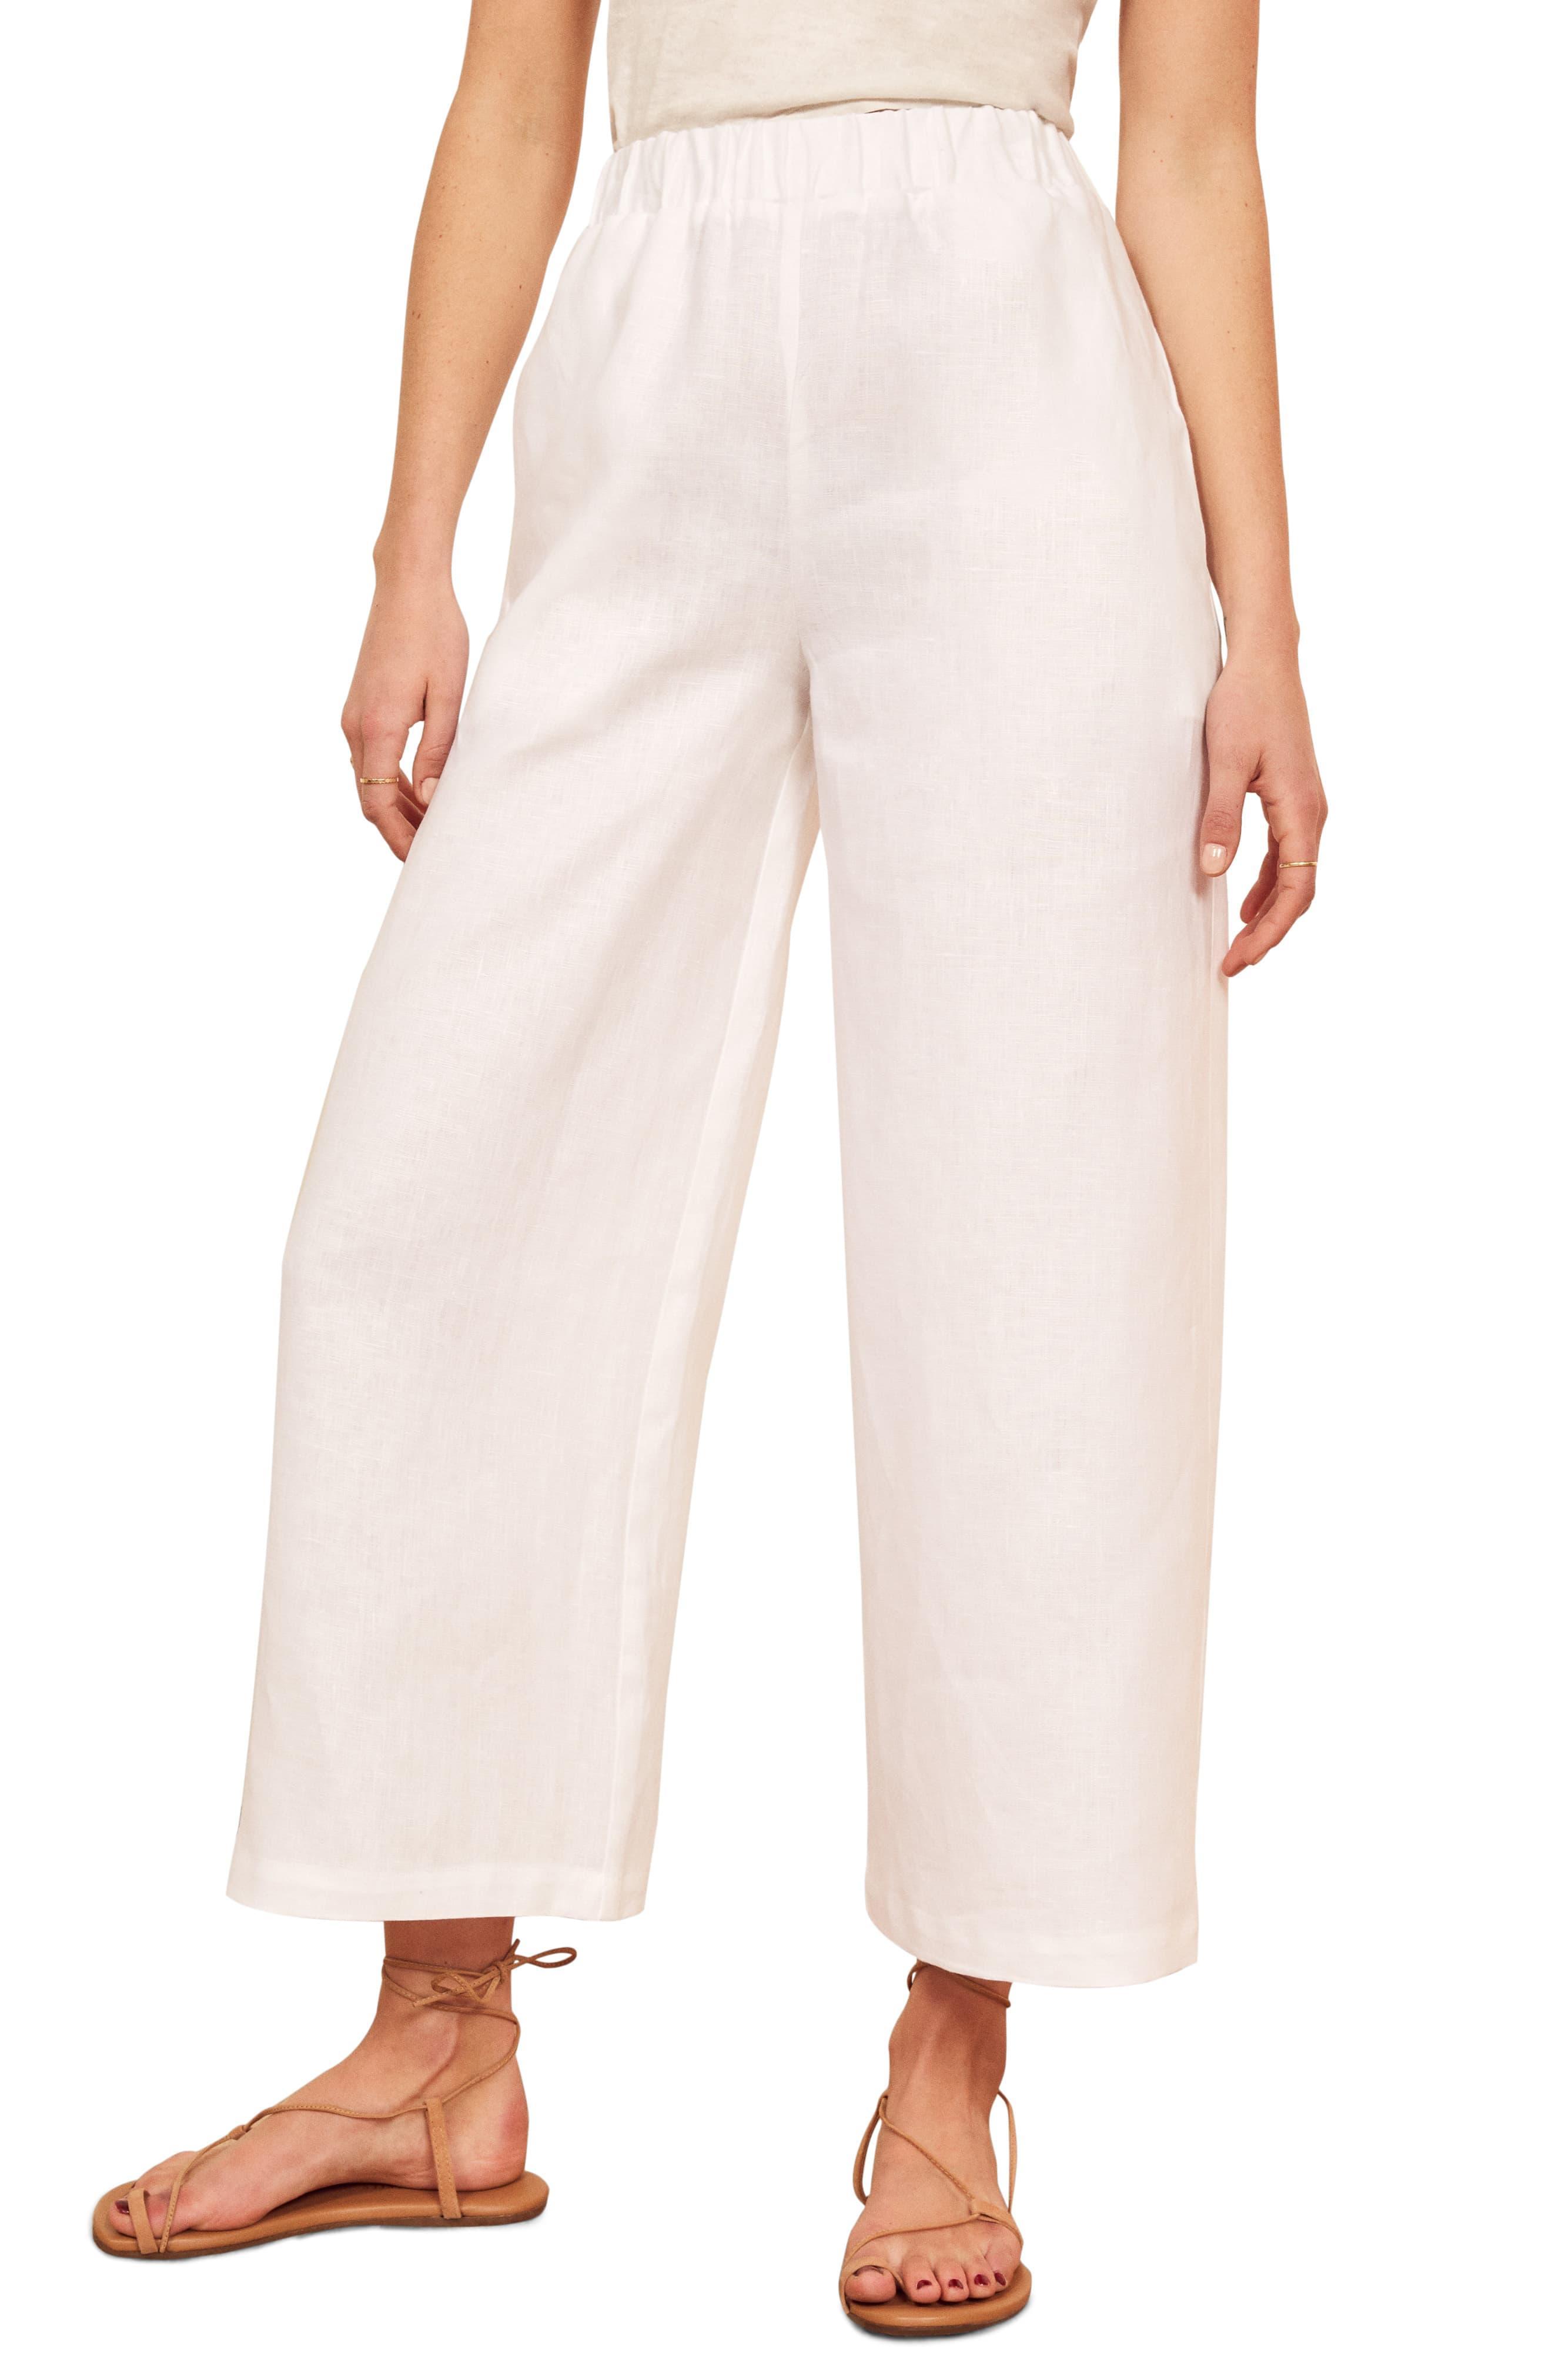 Chaps 100/% Cotton  Khaki Elastic Waist Pull on Poplin Cargo Shorts SR$45-72 NEW